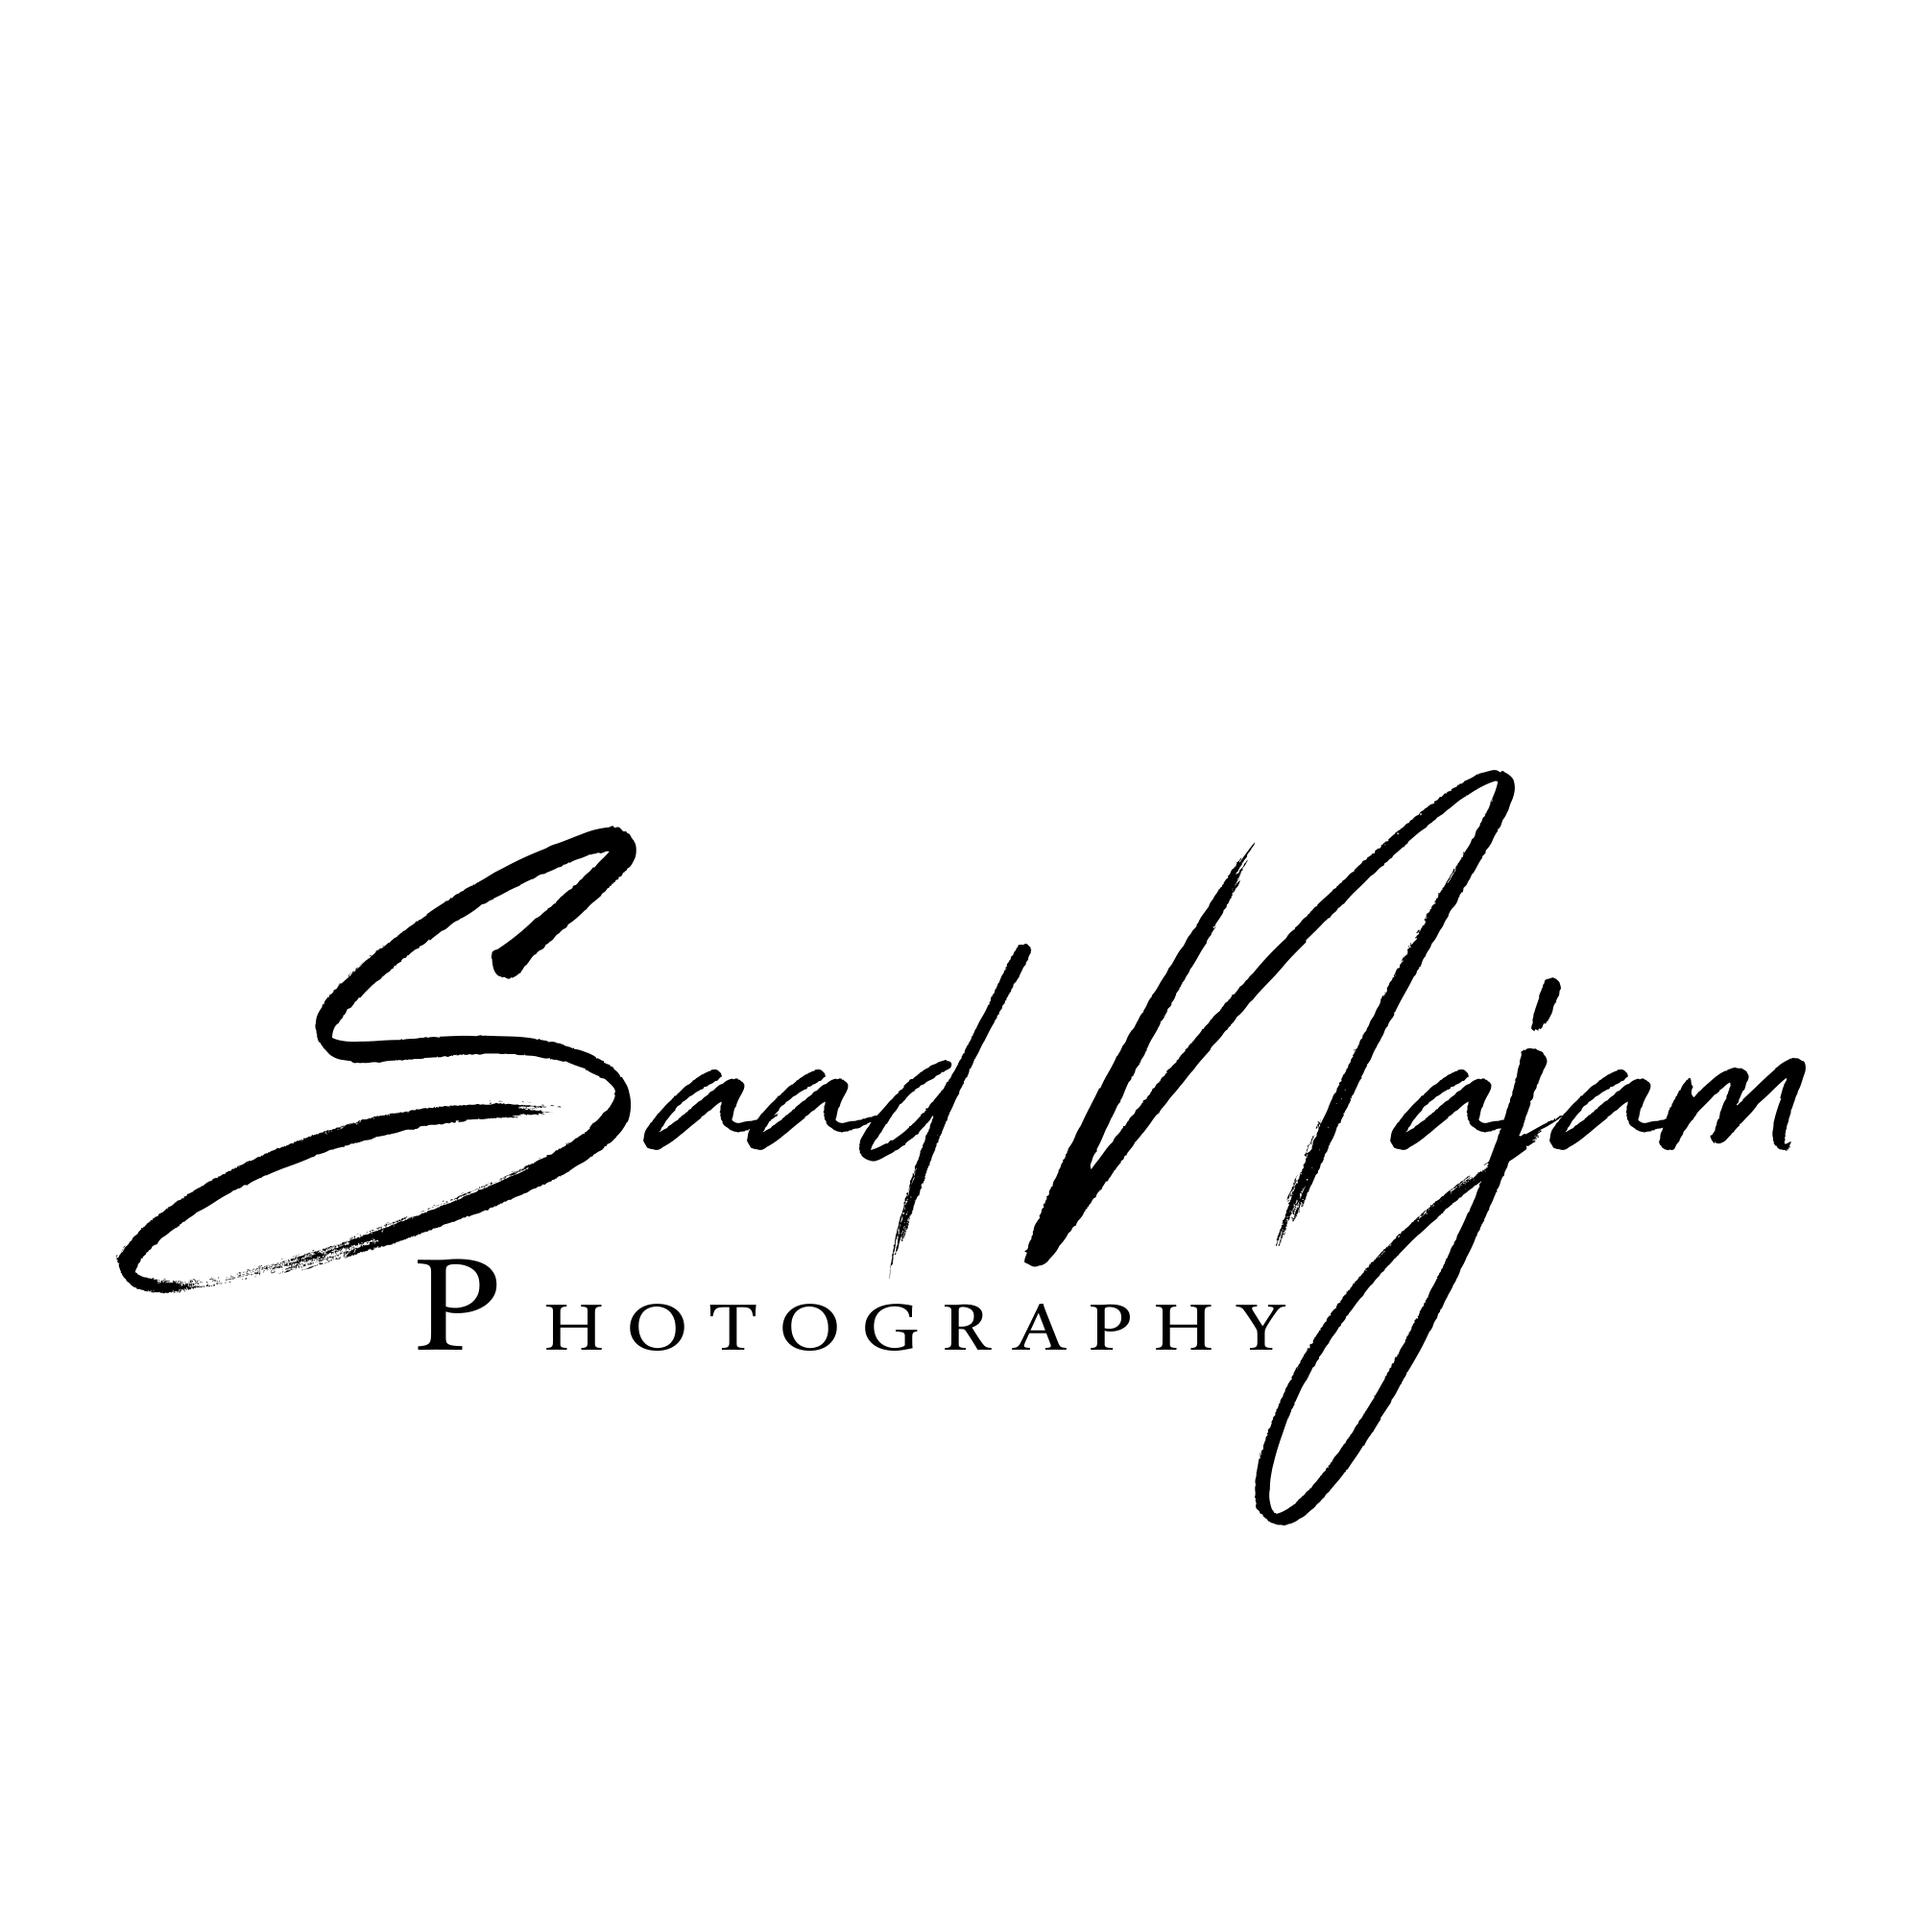 Saad Najam's Gallery